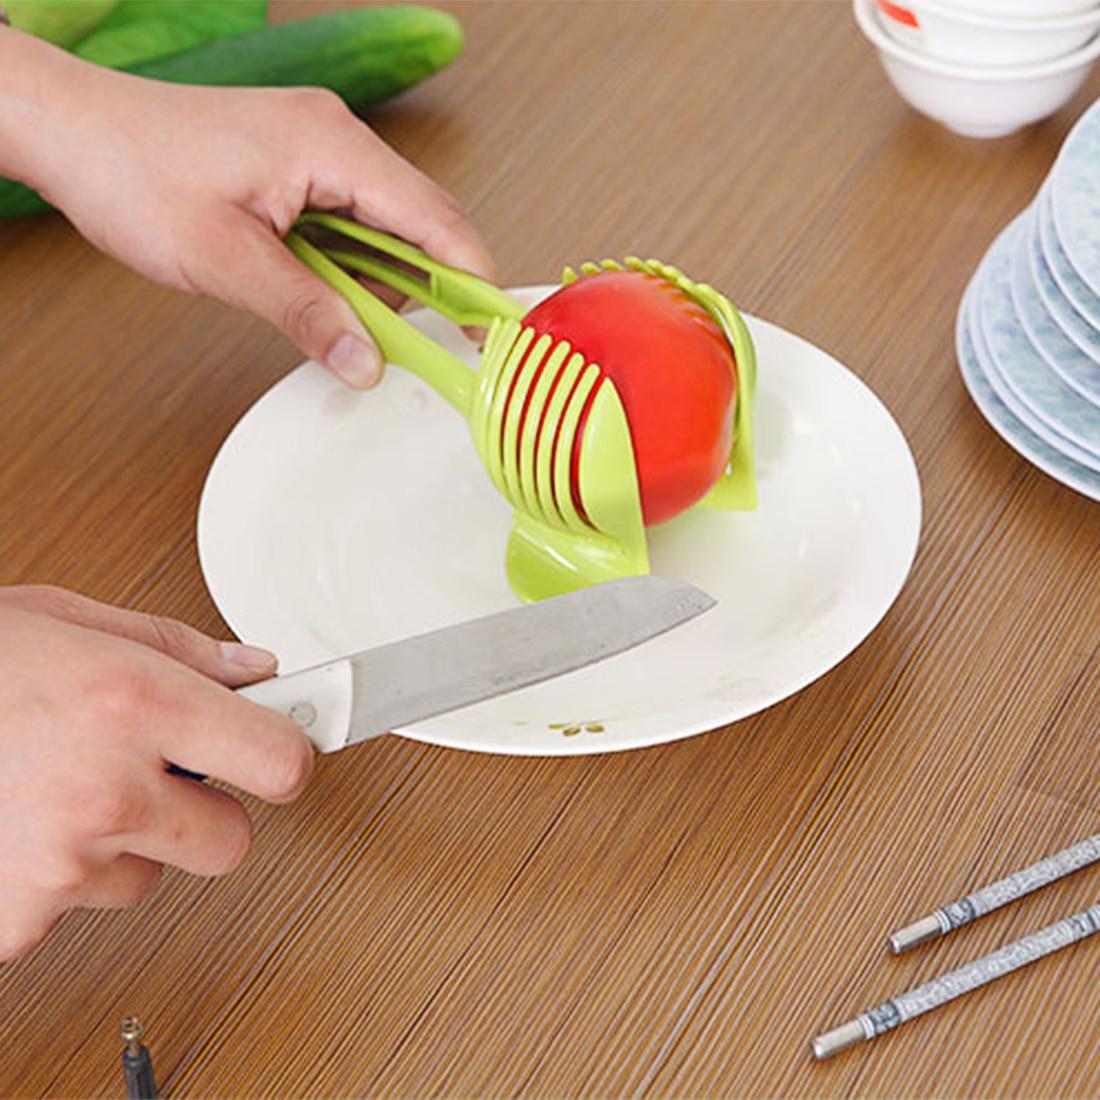 Tomato Slicer ABS Plastic Potato Cutter Kitchen Gadgets Lemon Orange Fruit Veget